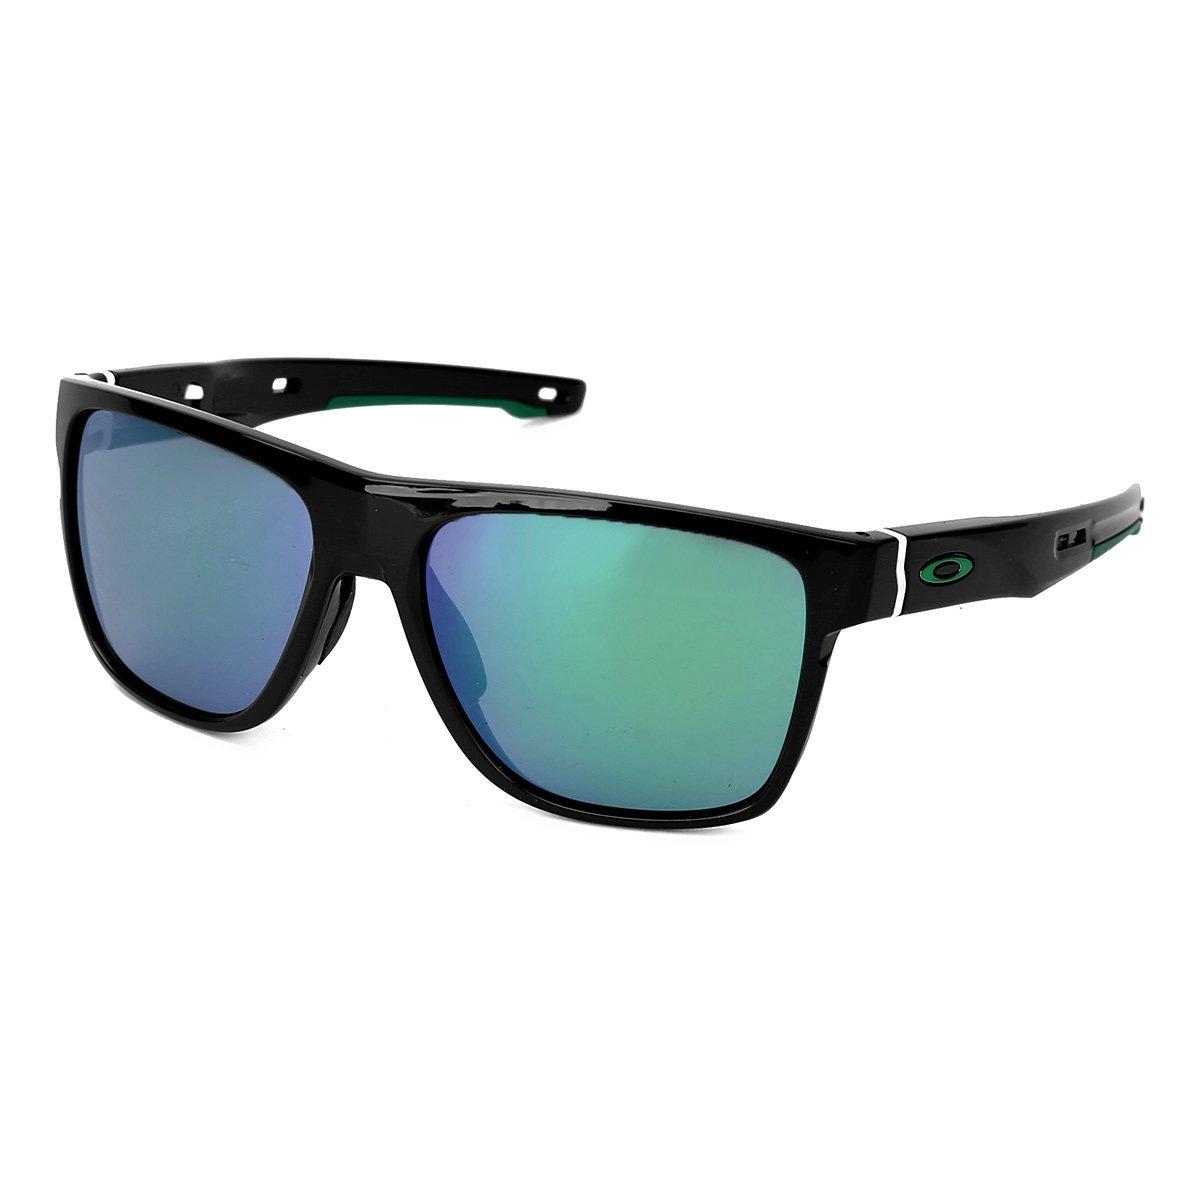 bfddcc8e8e8f7 Óculos de Sol Oakley Crossrange Xl Masculino - Compre Agora